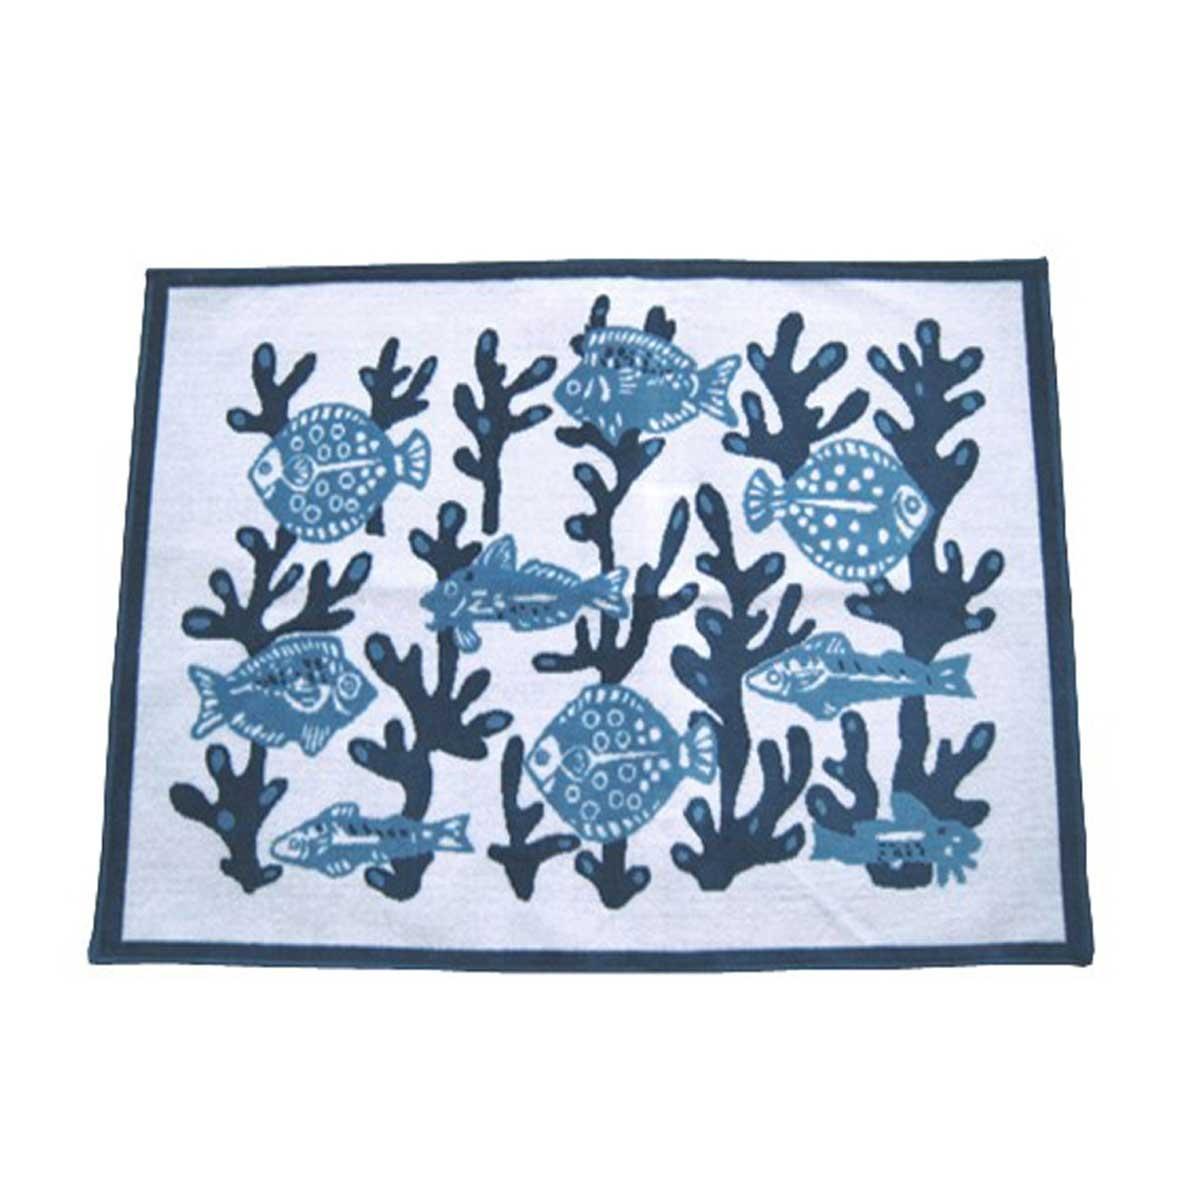 Tapis velours algues et poissons bleus (Bleu)